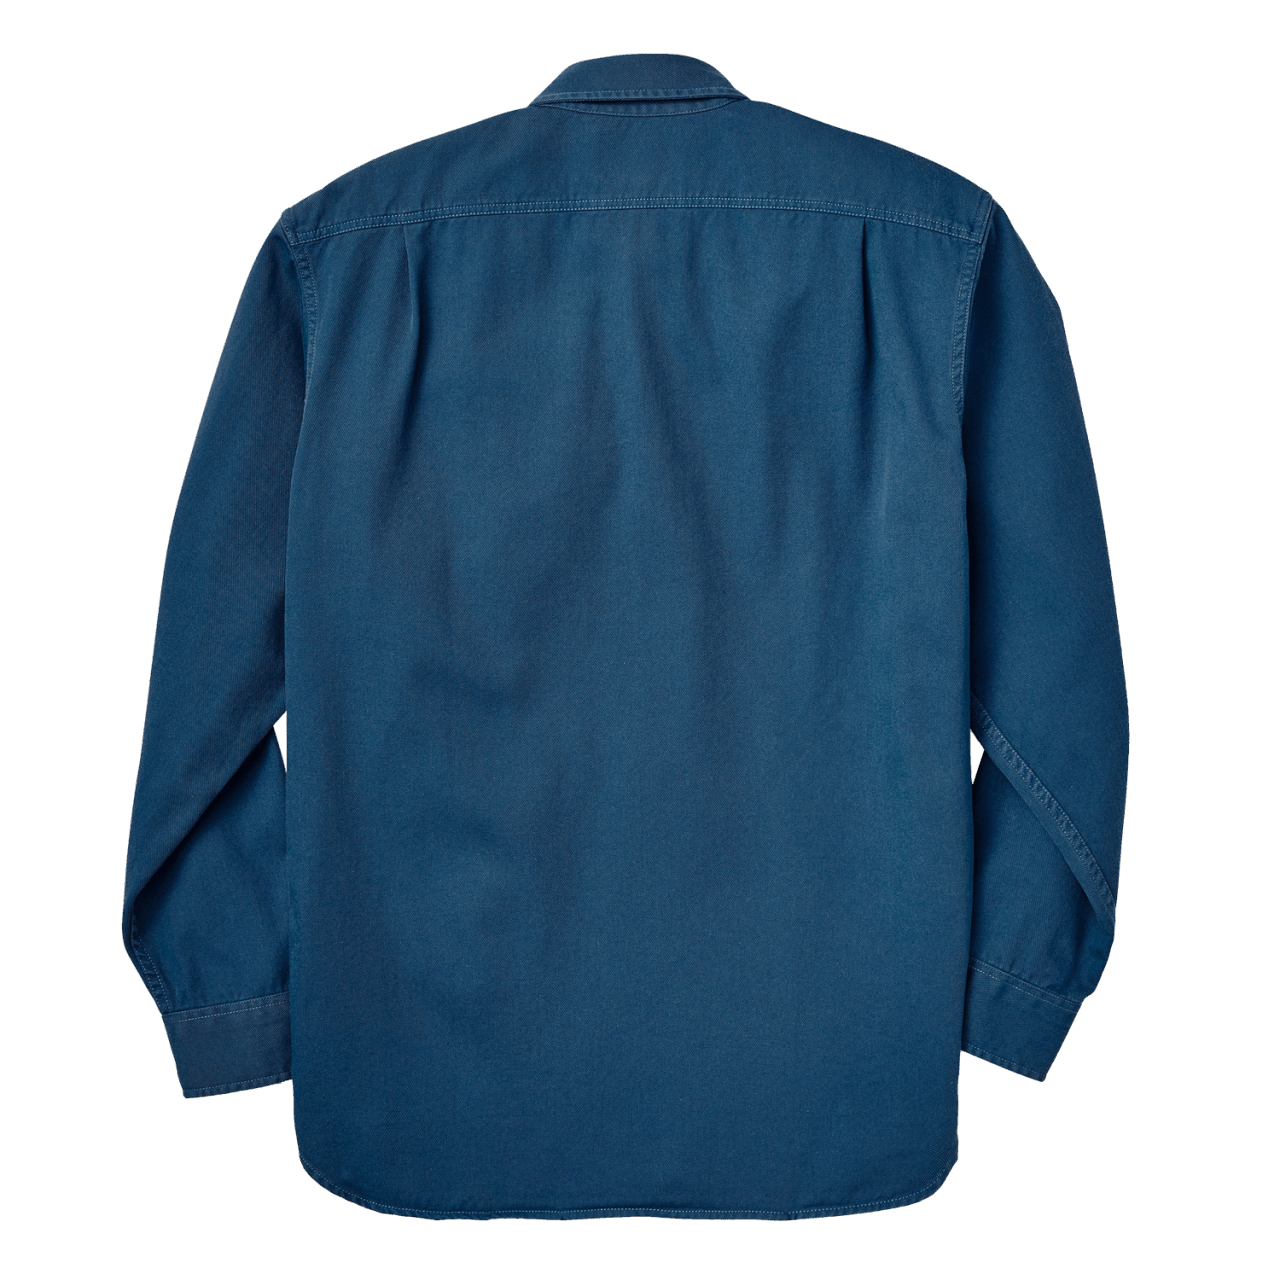 Filson Chino Twill Shirt - Grouse-blue